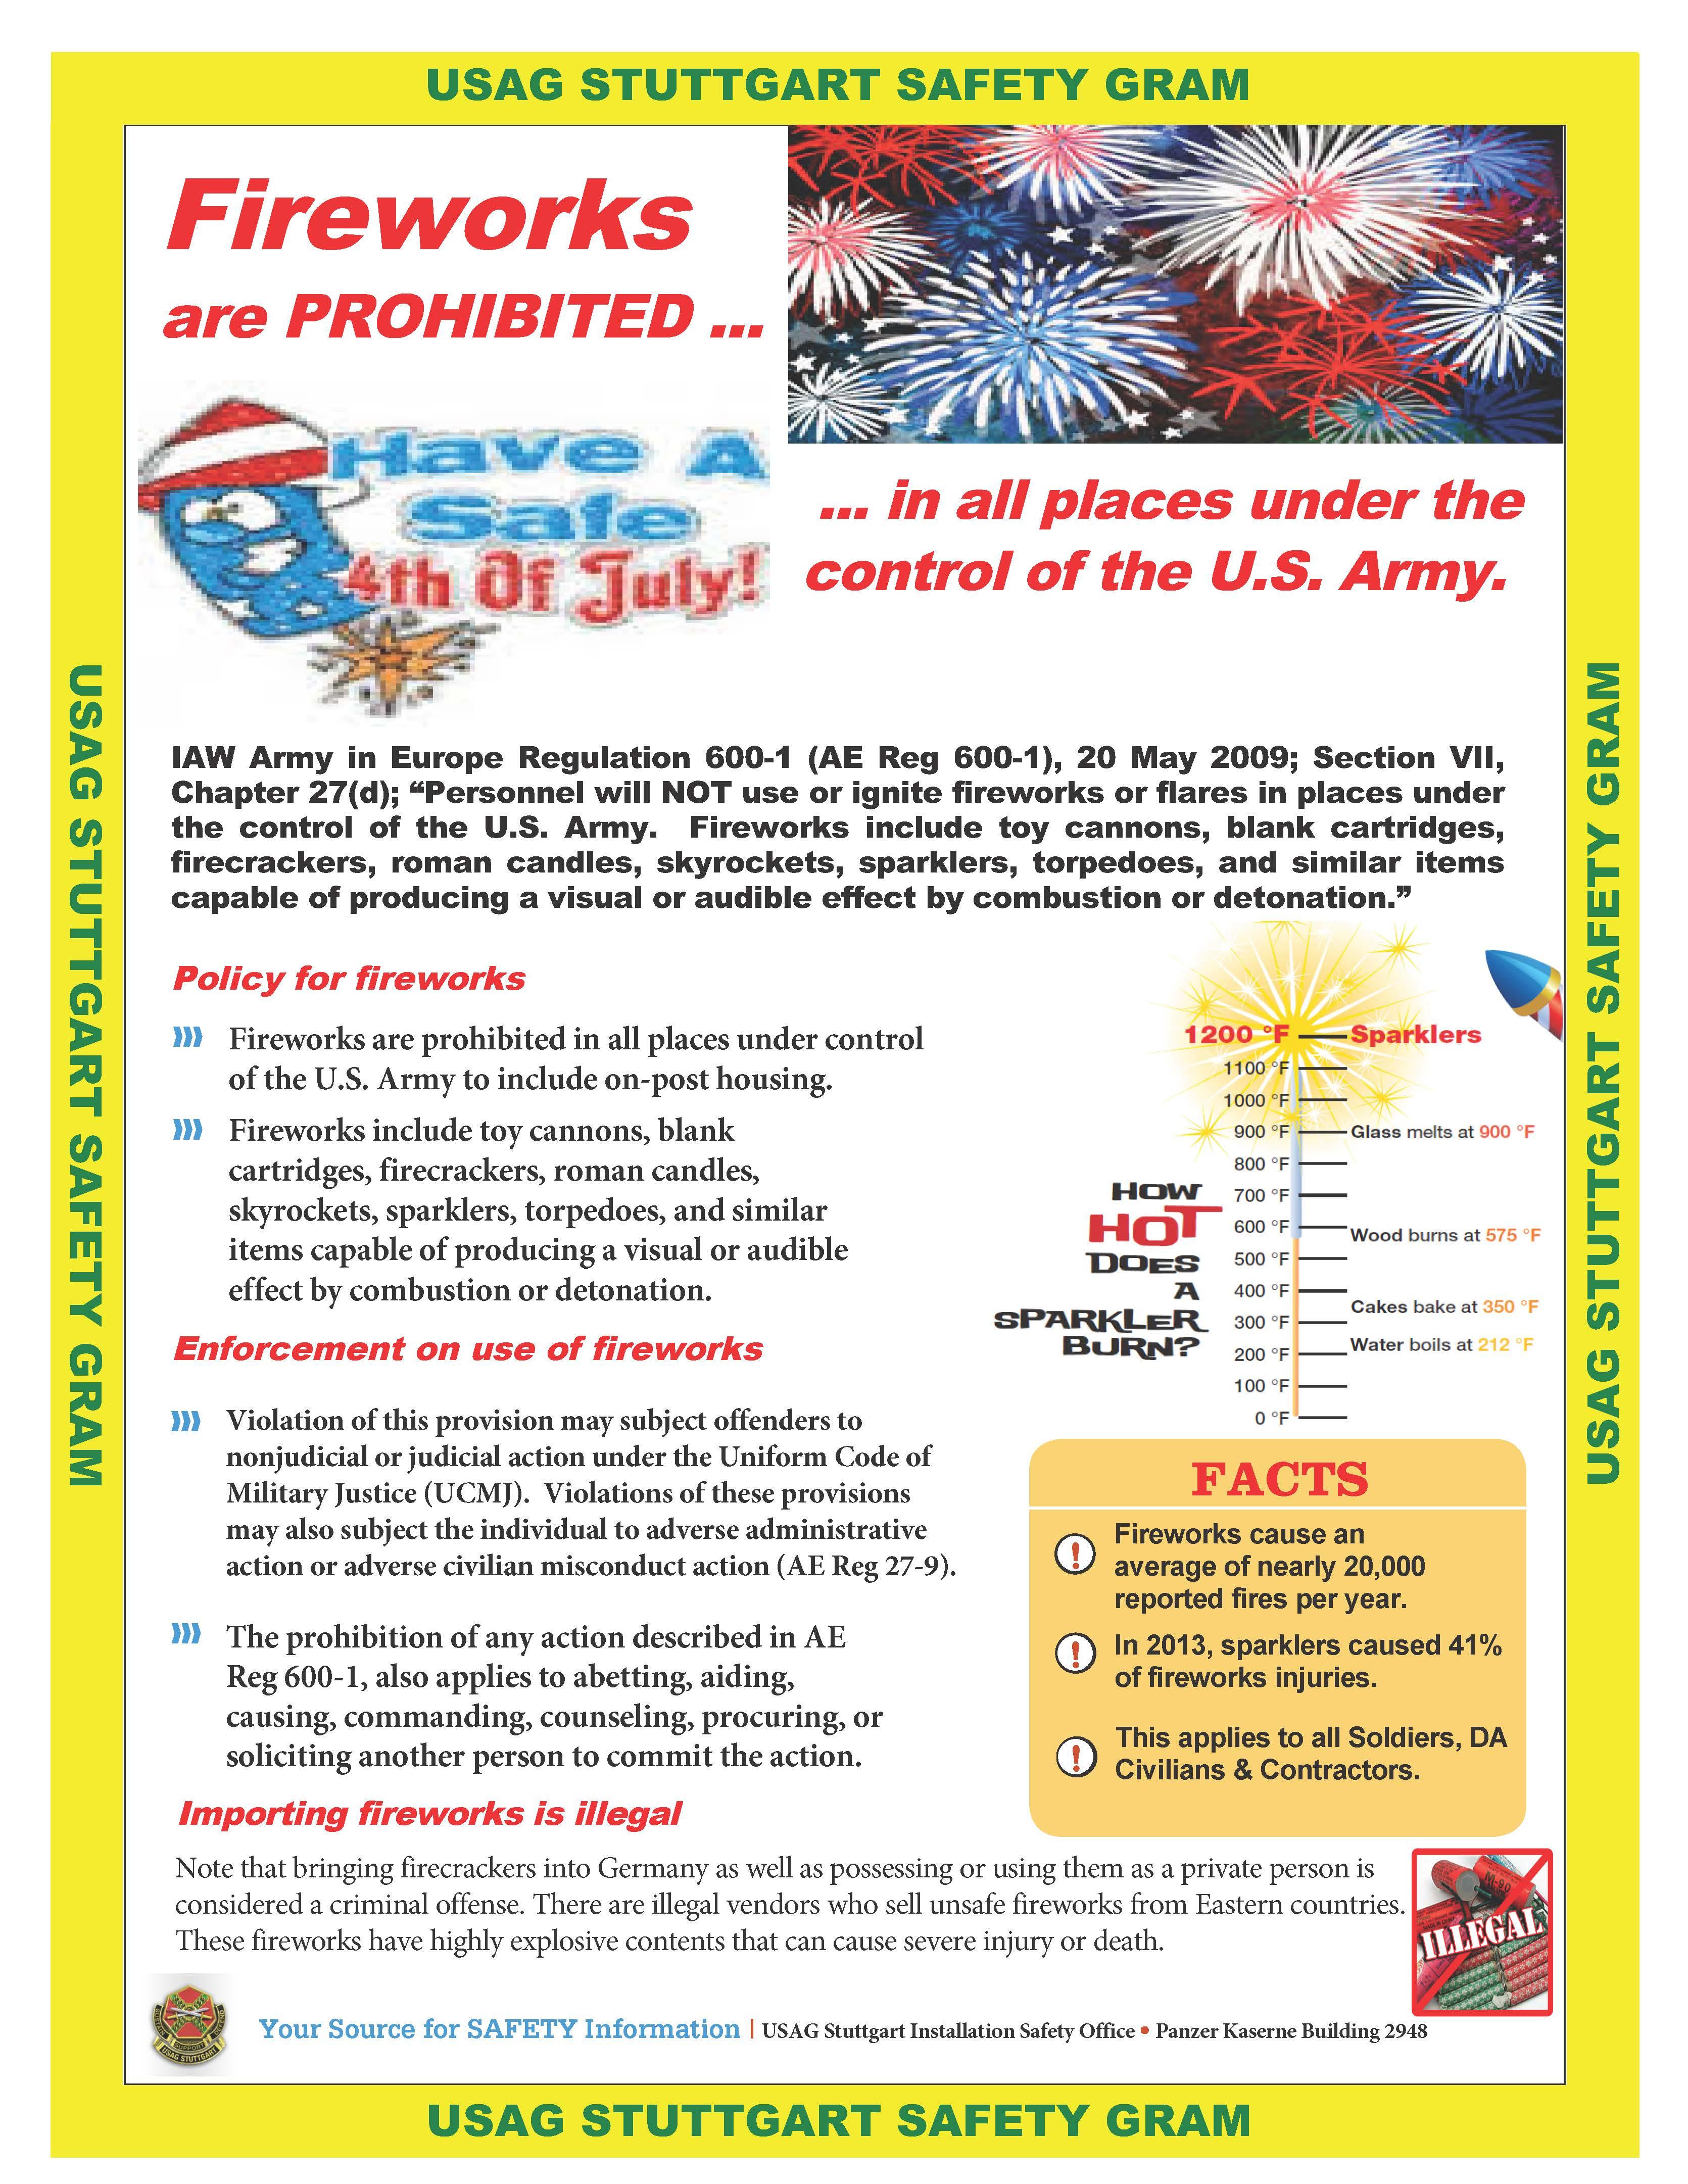 USAG-S Safety Gram Fireworks AE Reg  600-1